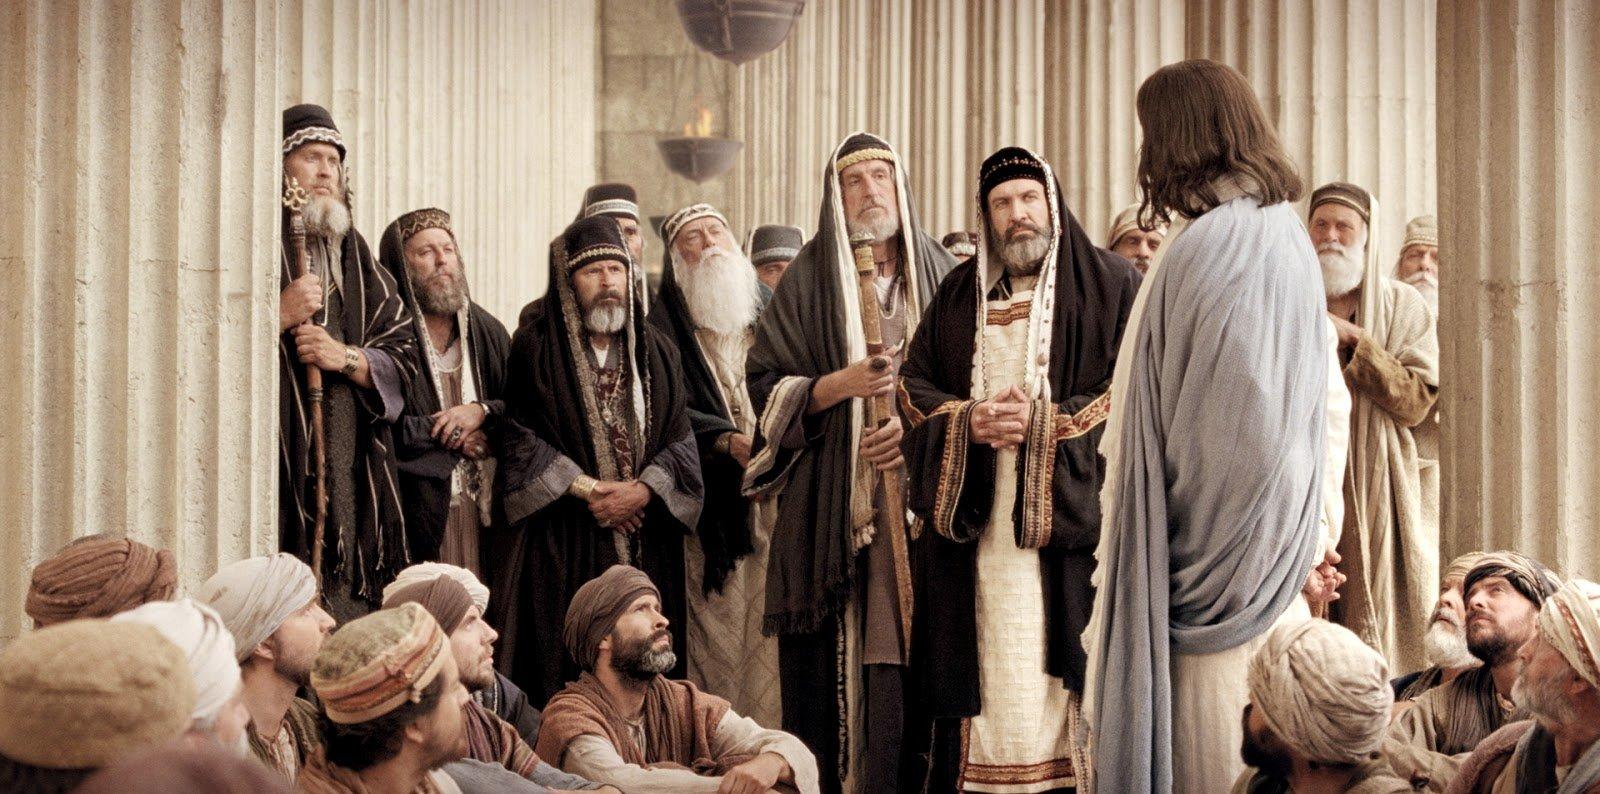 Jesus before the hypocrites.